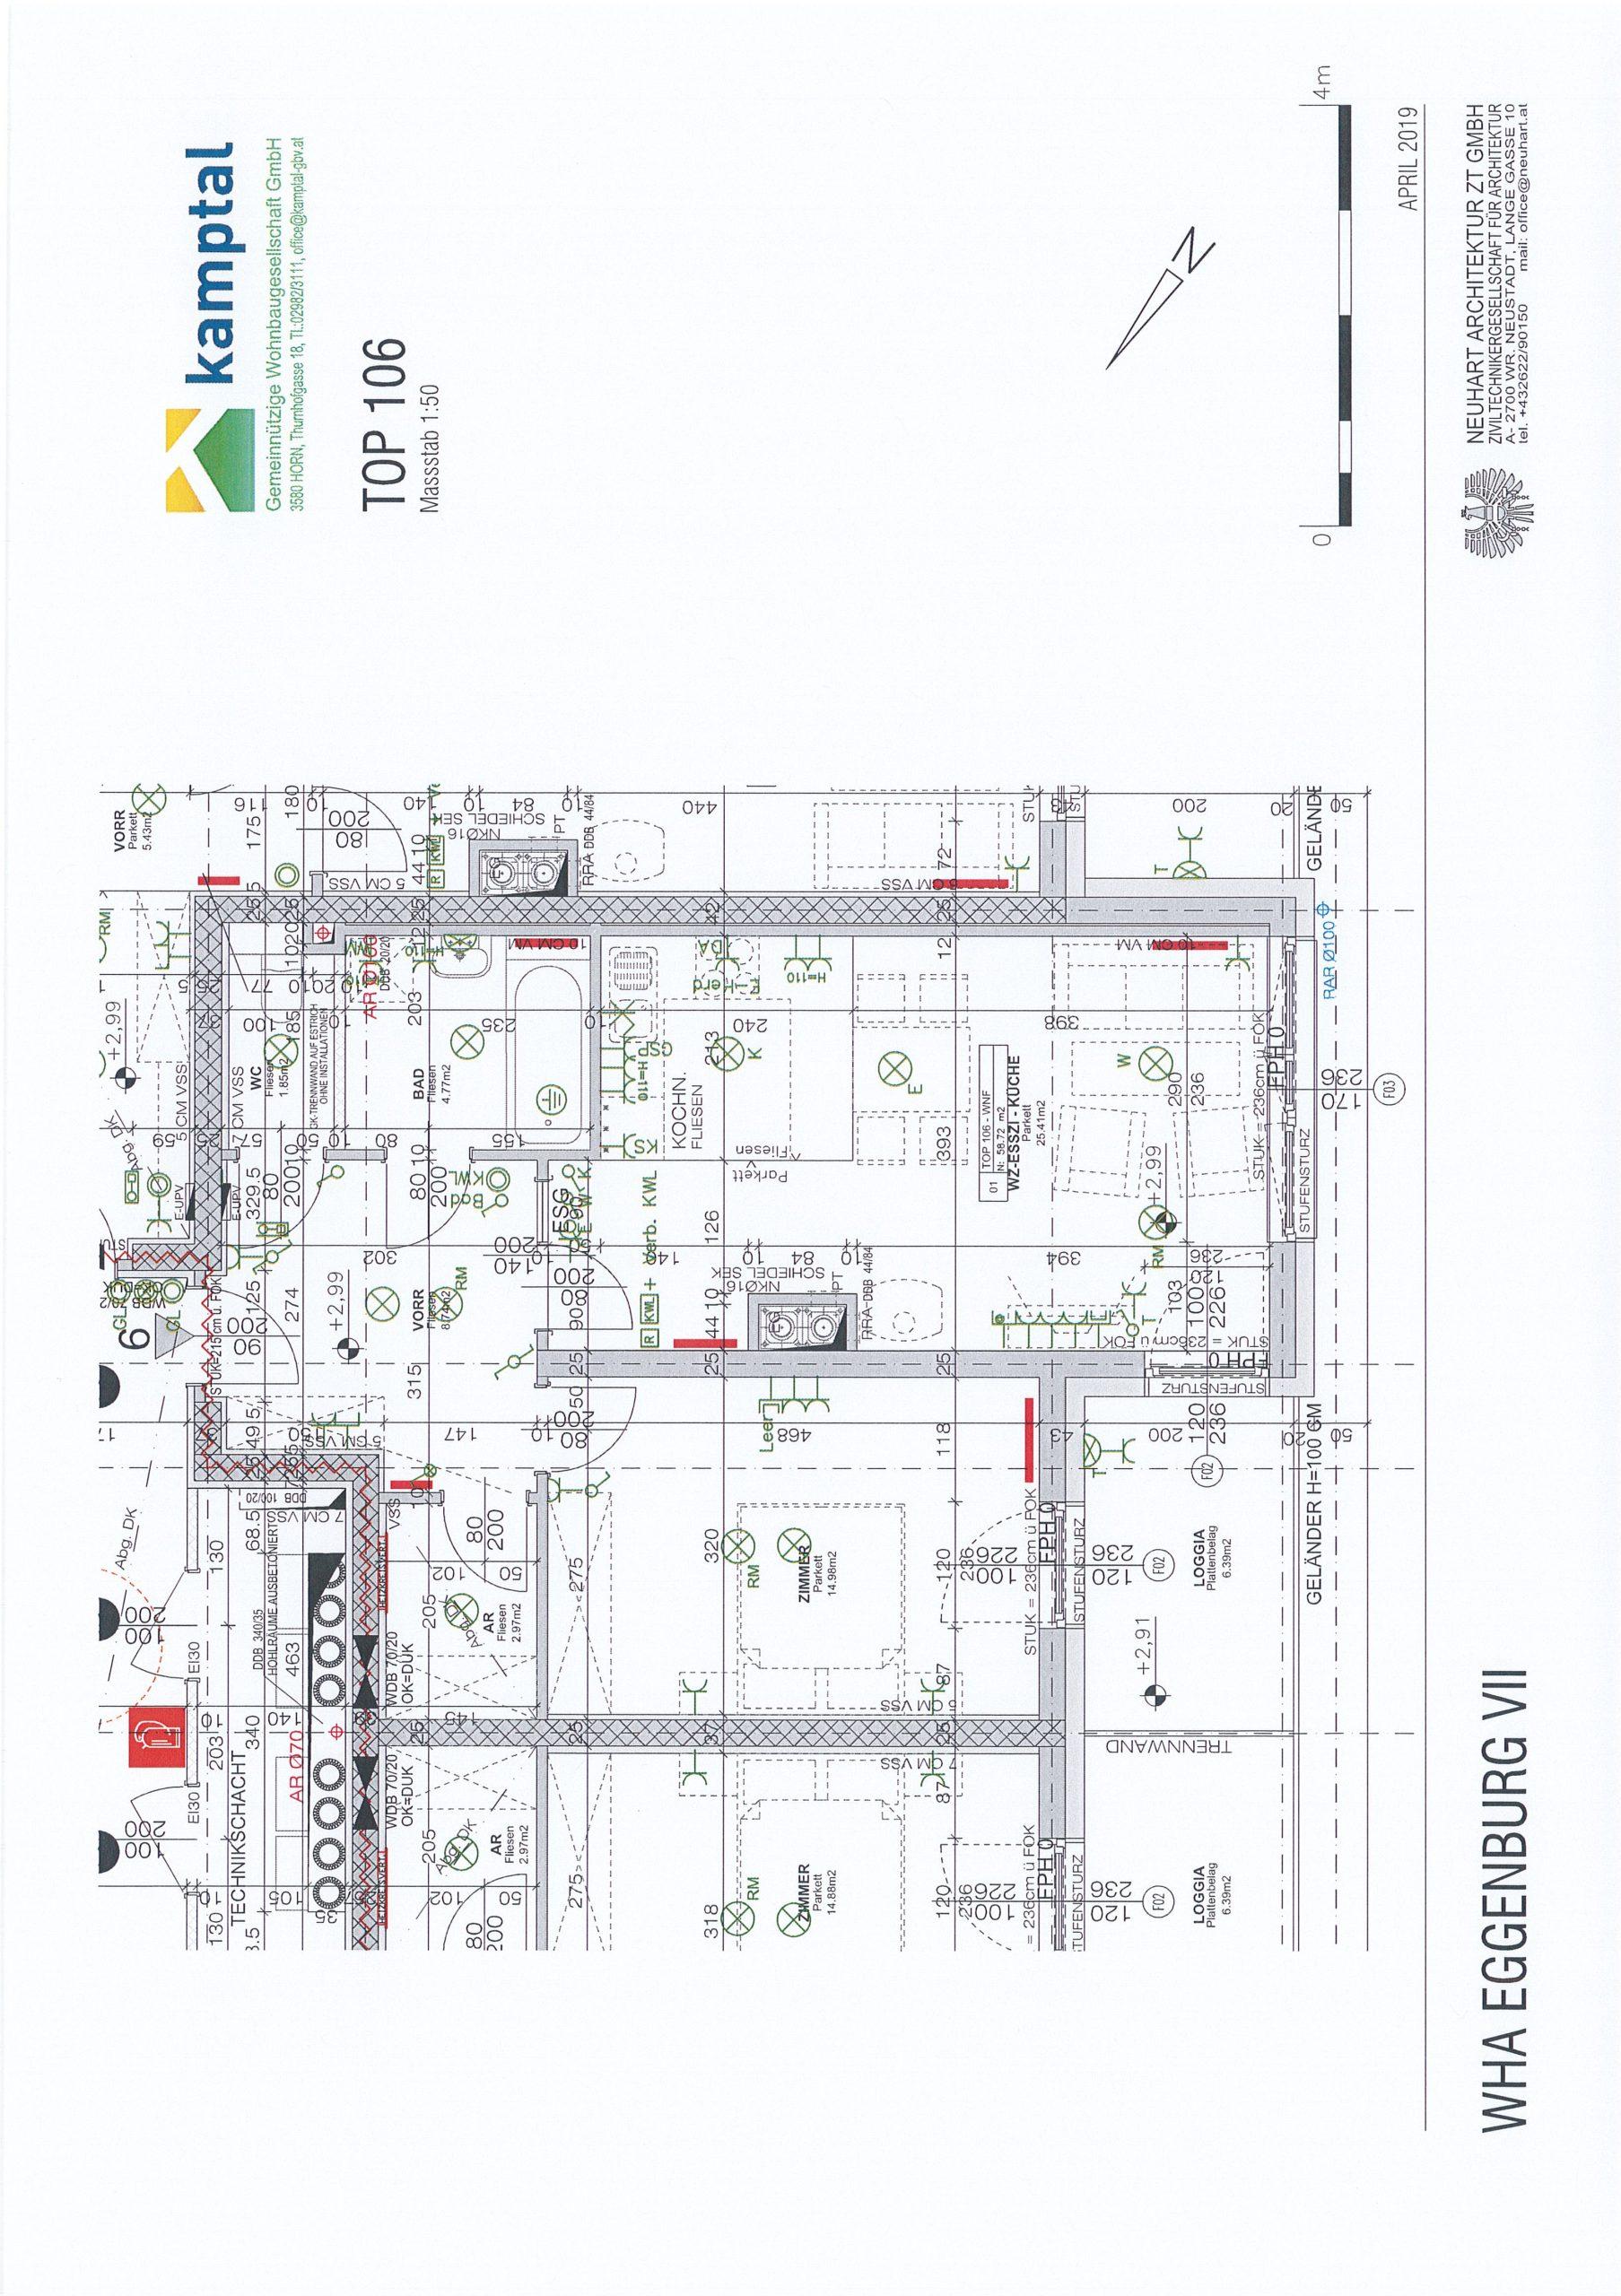 Immobilie von Kamptal in 3730 Eggenburg, Horn, Eggenburg VII - Top 106 #10